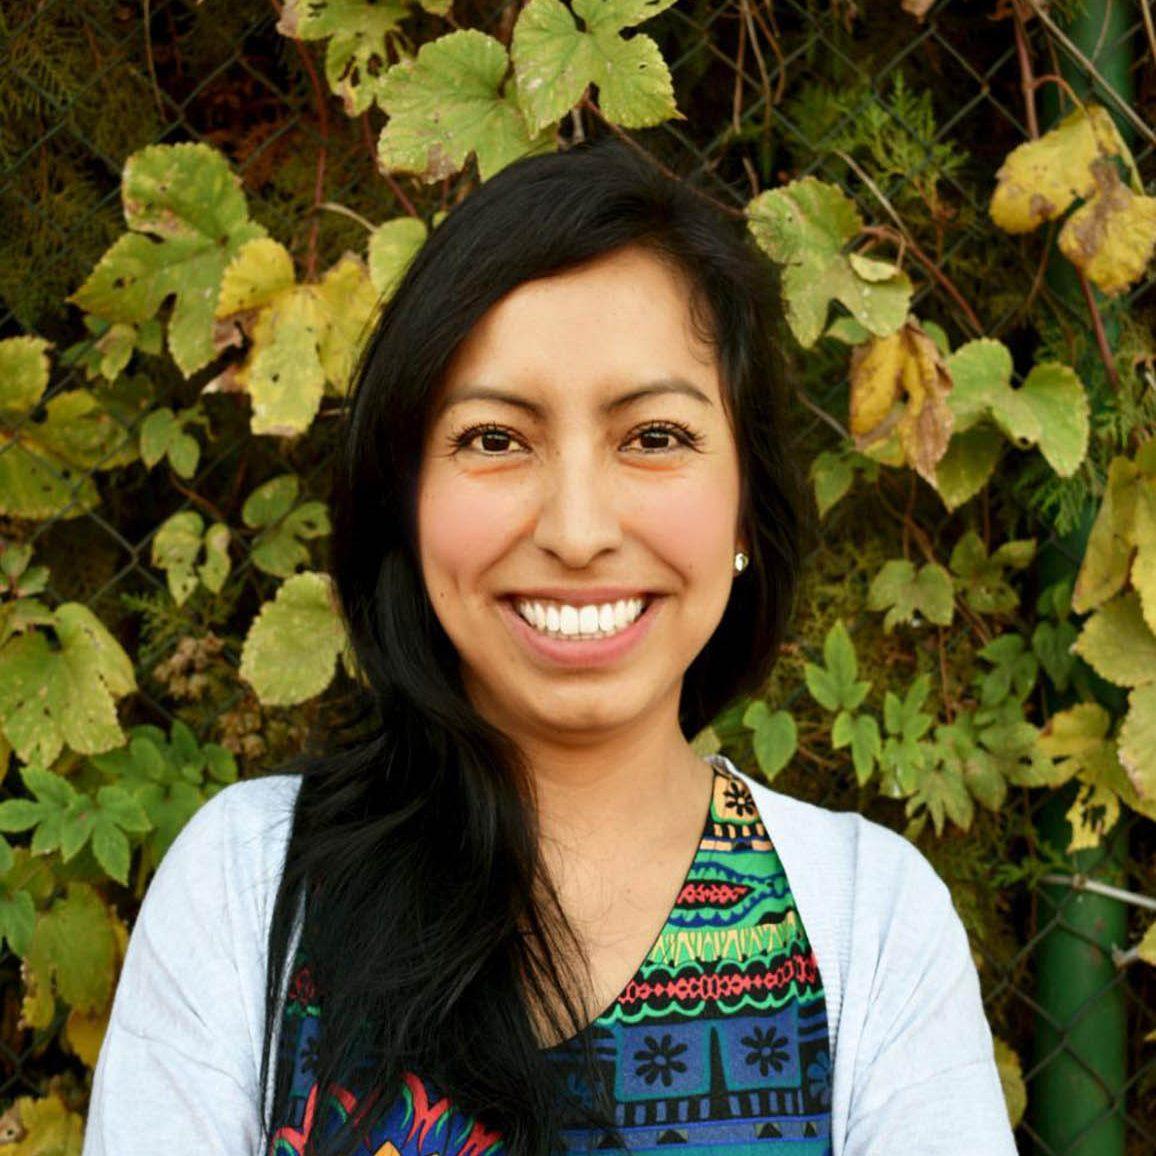 Ana Terrazos - Senior Account Manager at Beeanerd